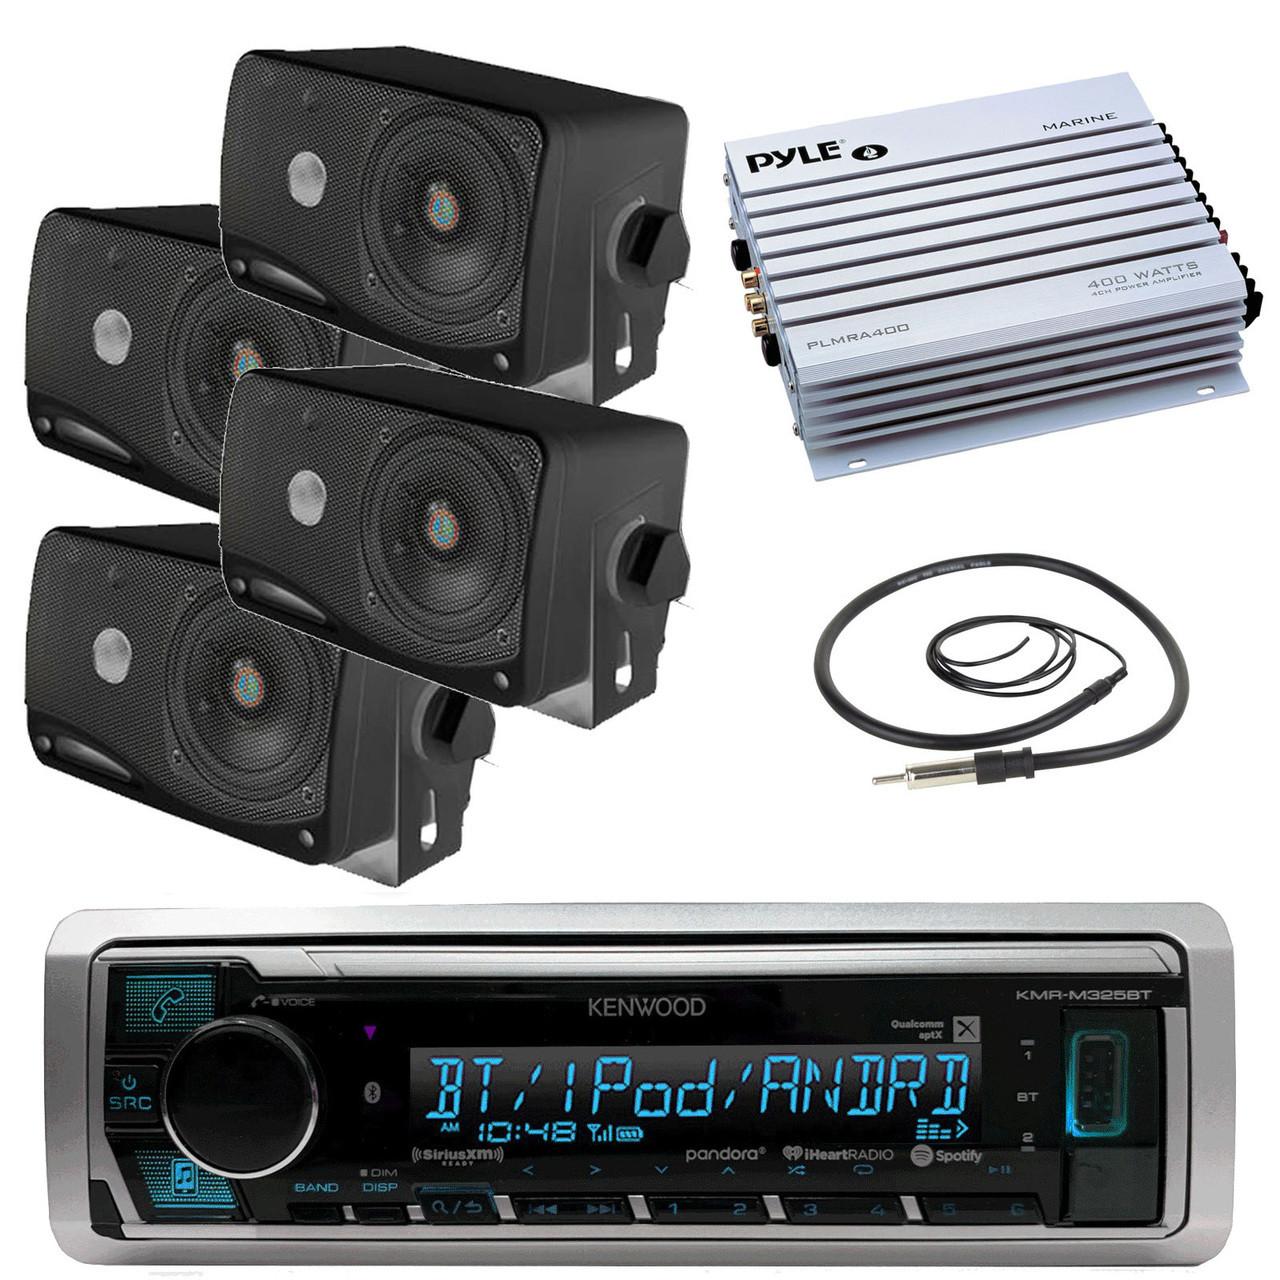 Kenwood Marine Digital Media Bluetooth Receiver, 4x Pyle 3 5'' Speakers  (Black), Pyle 4 Channel Waterproof Amplifier (White), Antenna - 40